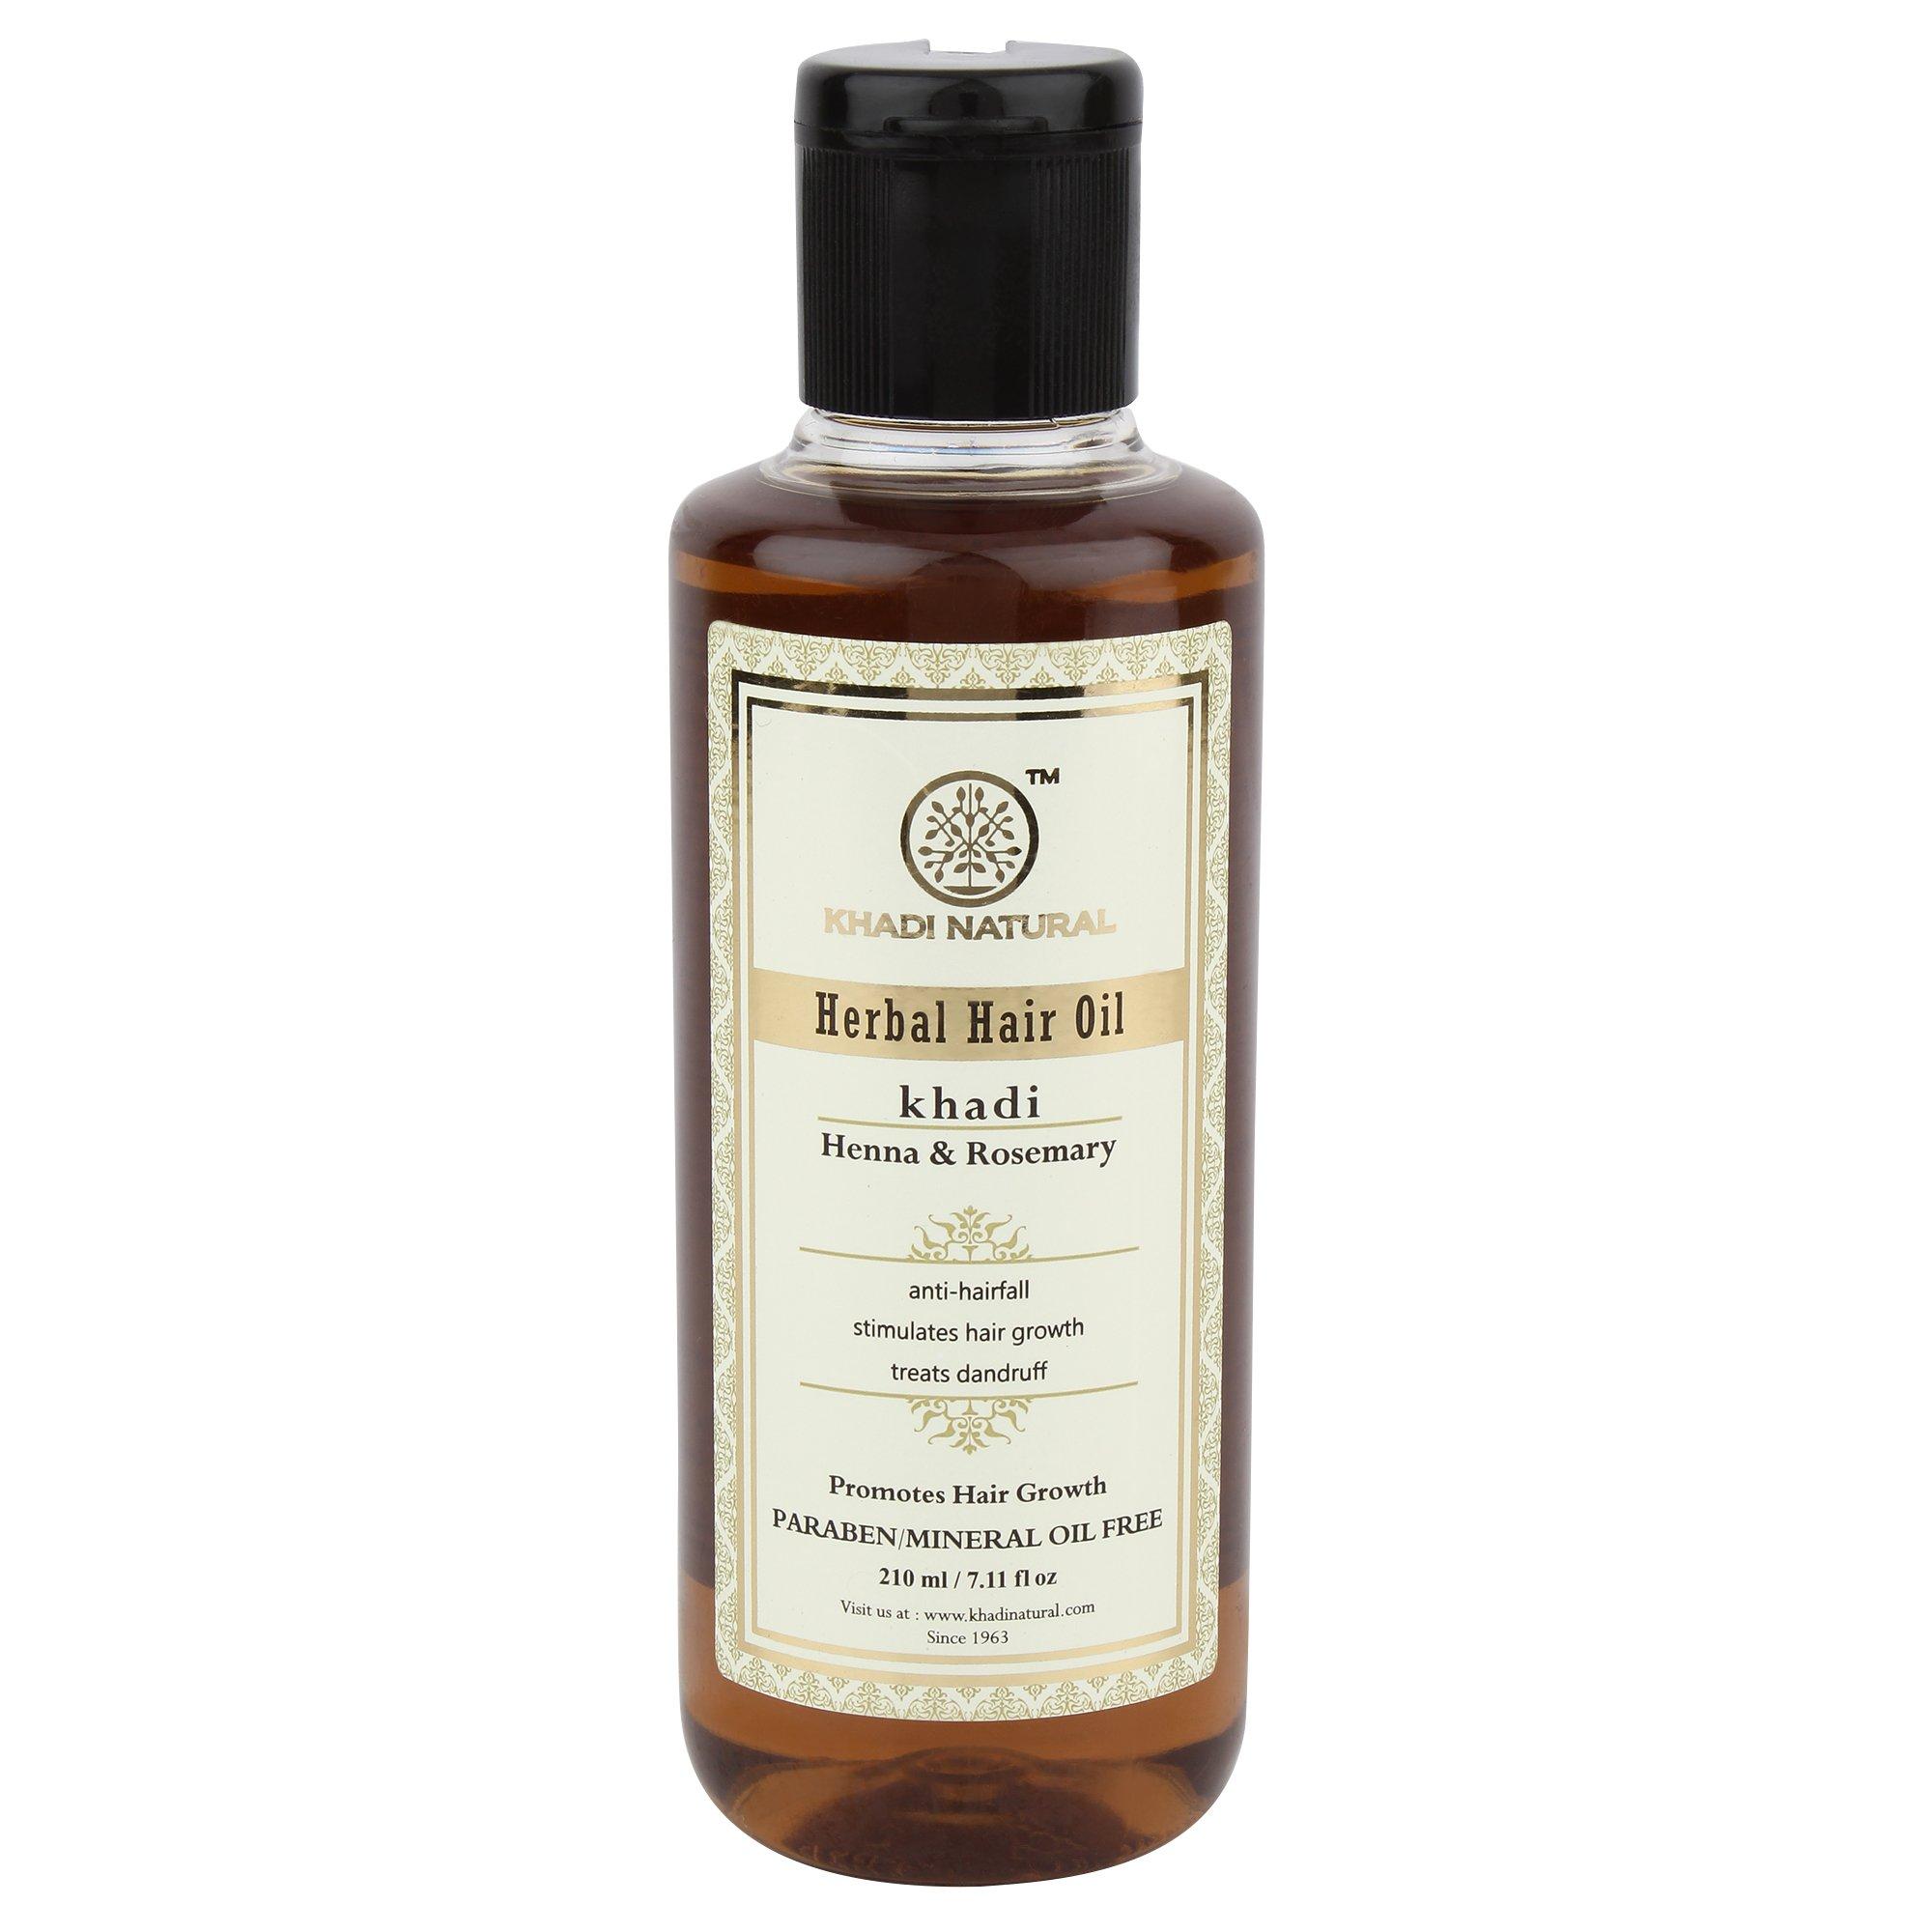 Khadi Natural Herbal Ayurvedic Rosemary and Henna Hair Oil (210 ml) by KHADI